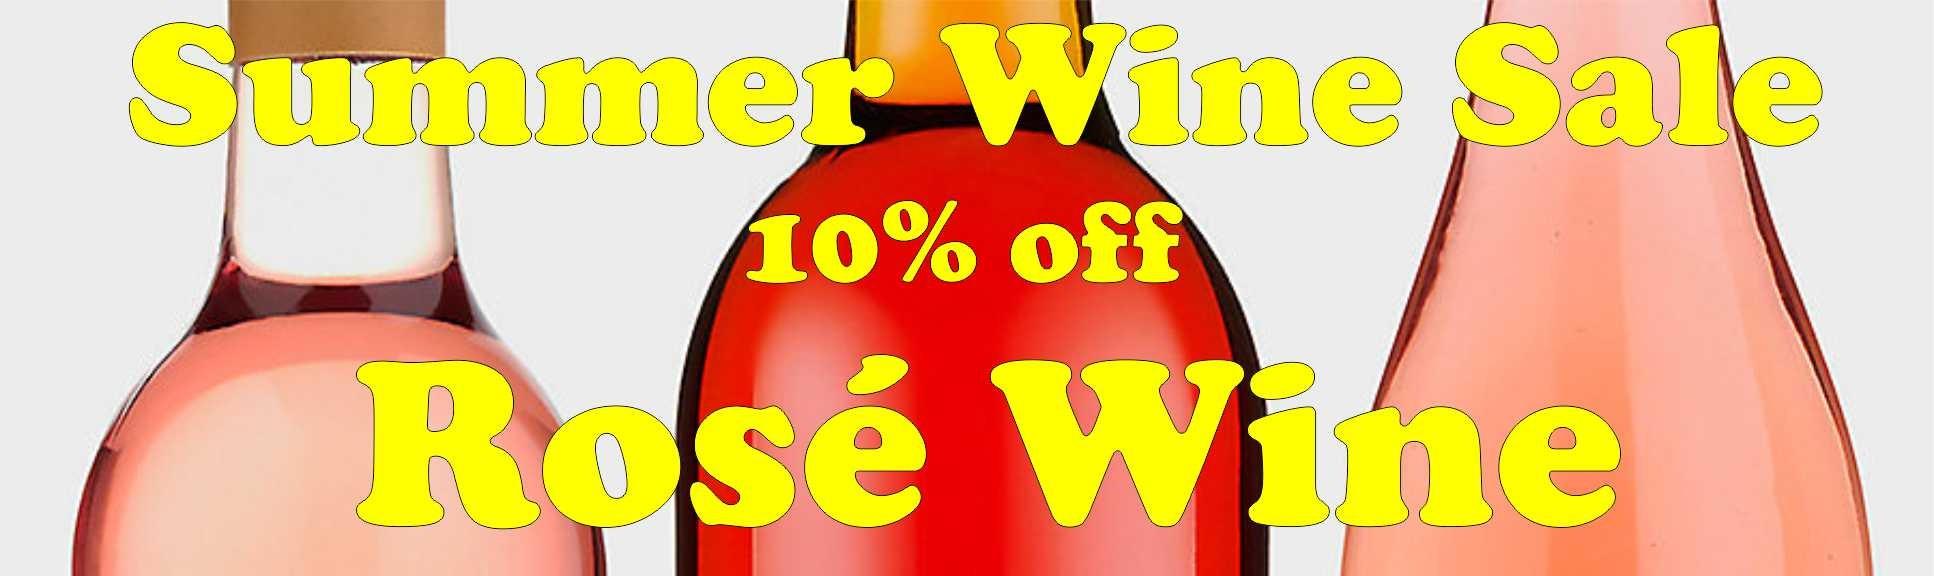 Rose Wines - 10% Off!